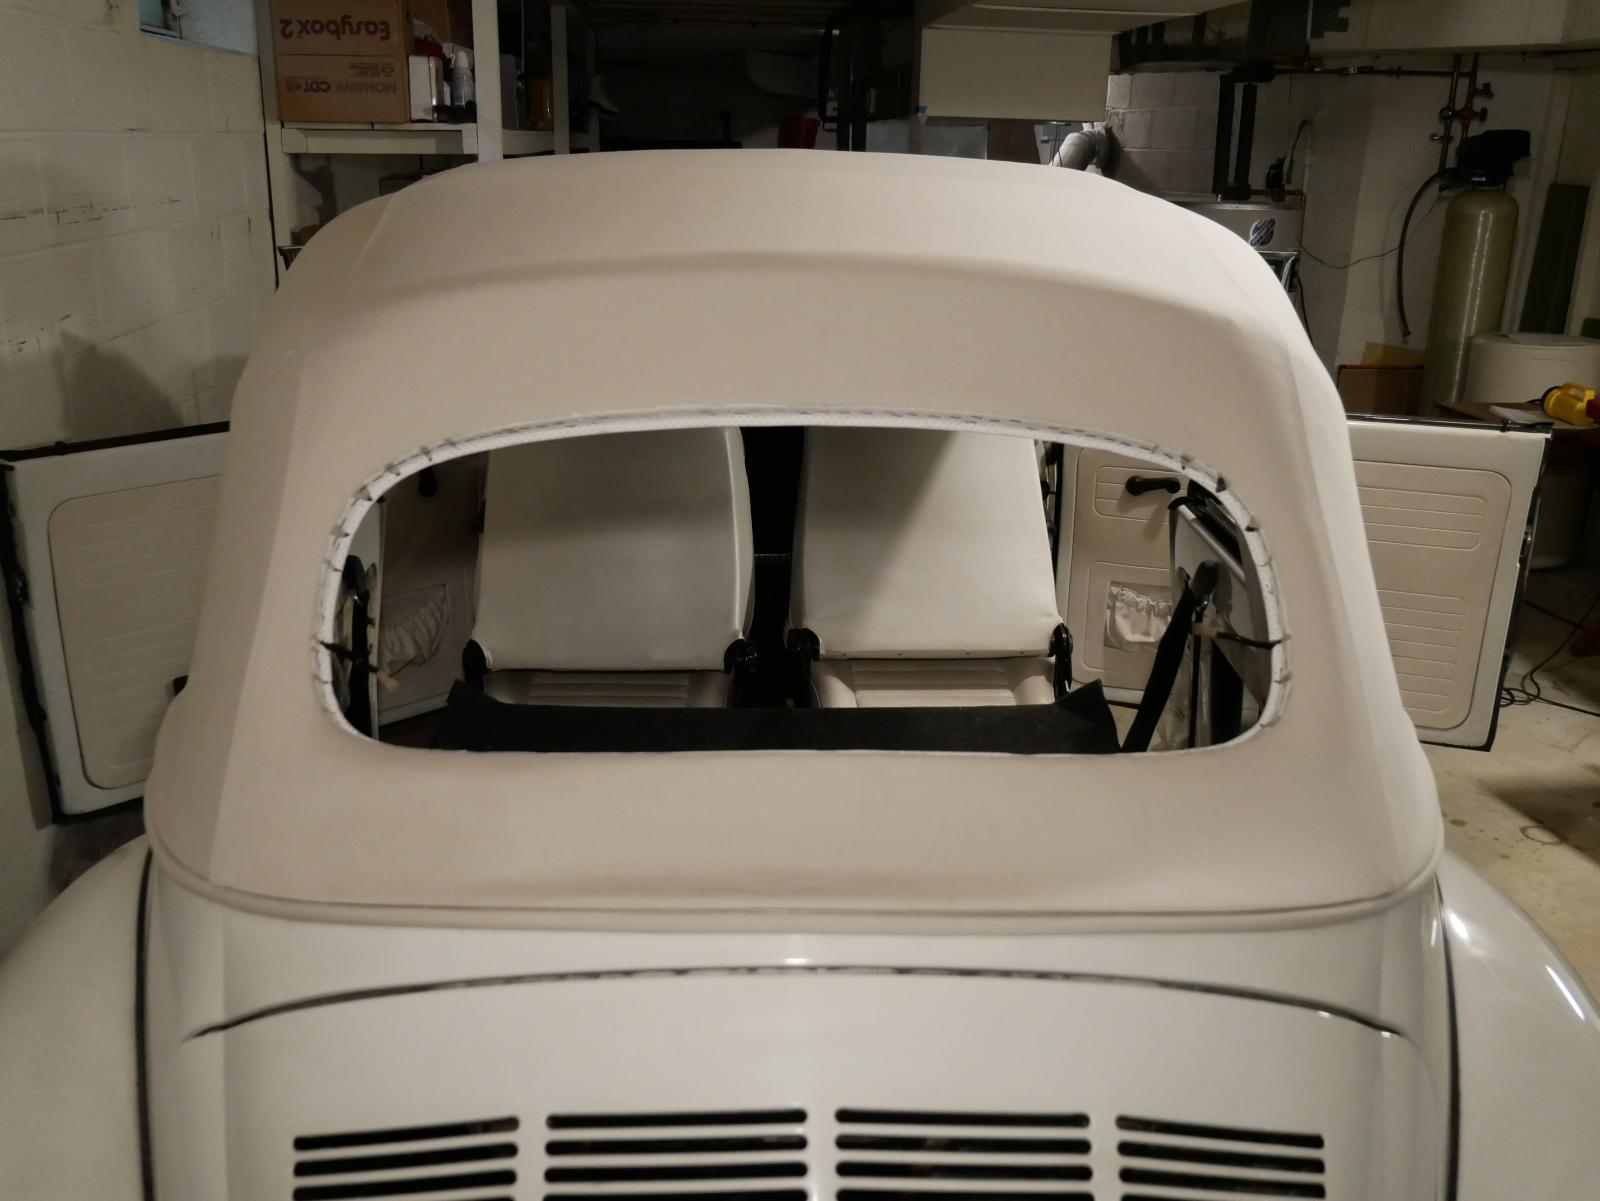 '79 Super Beetle ready for rear window installation